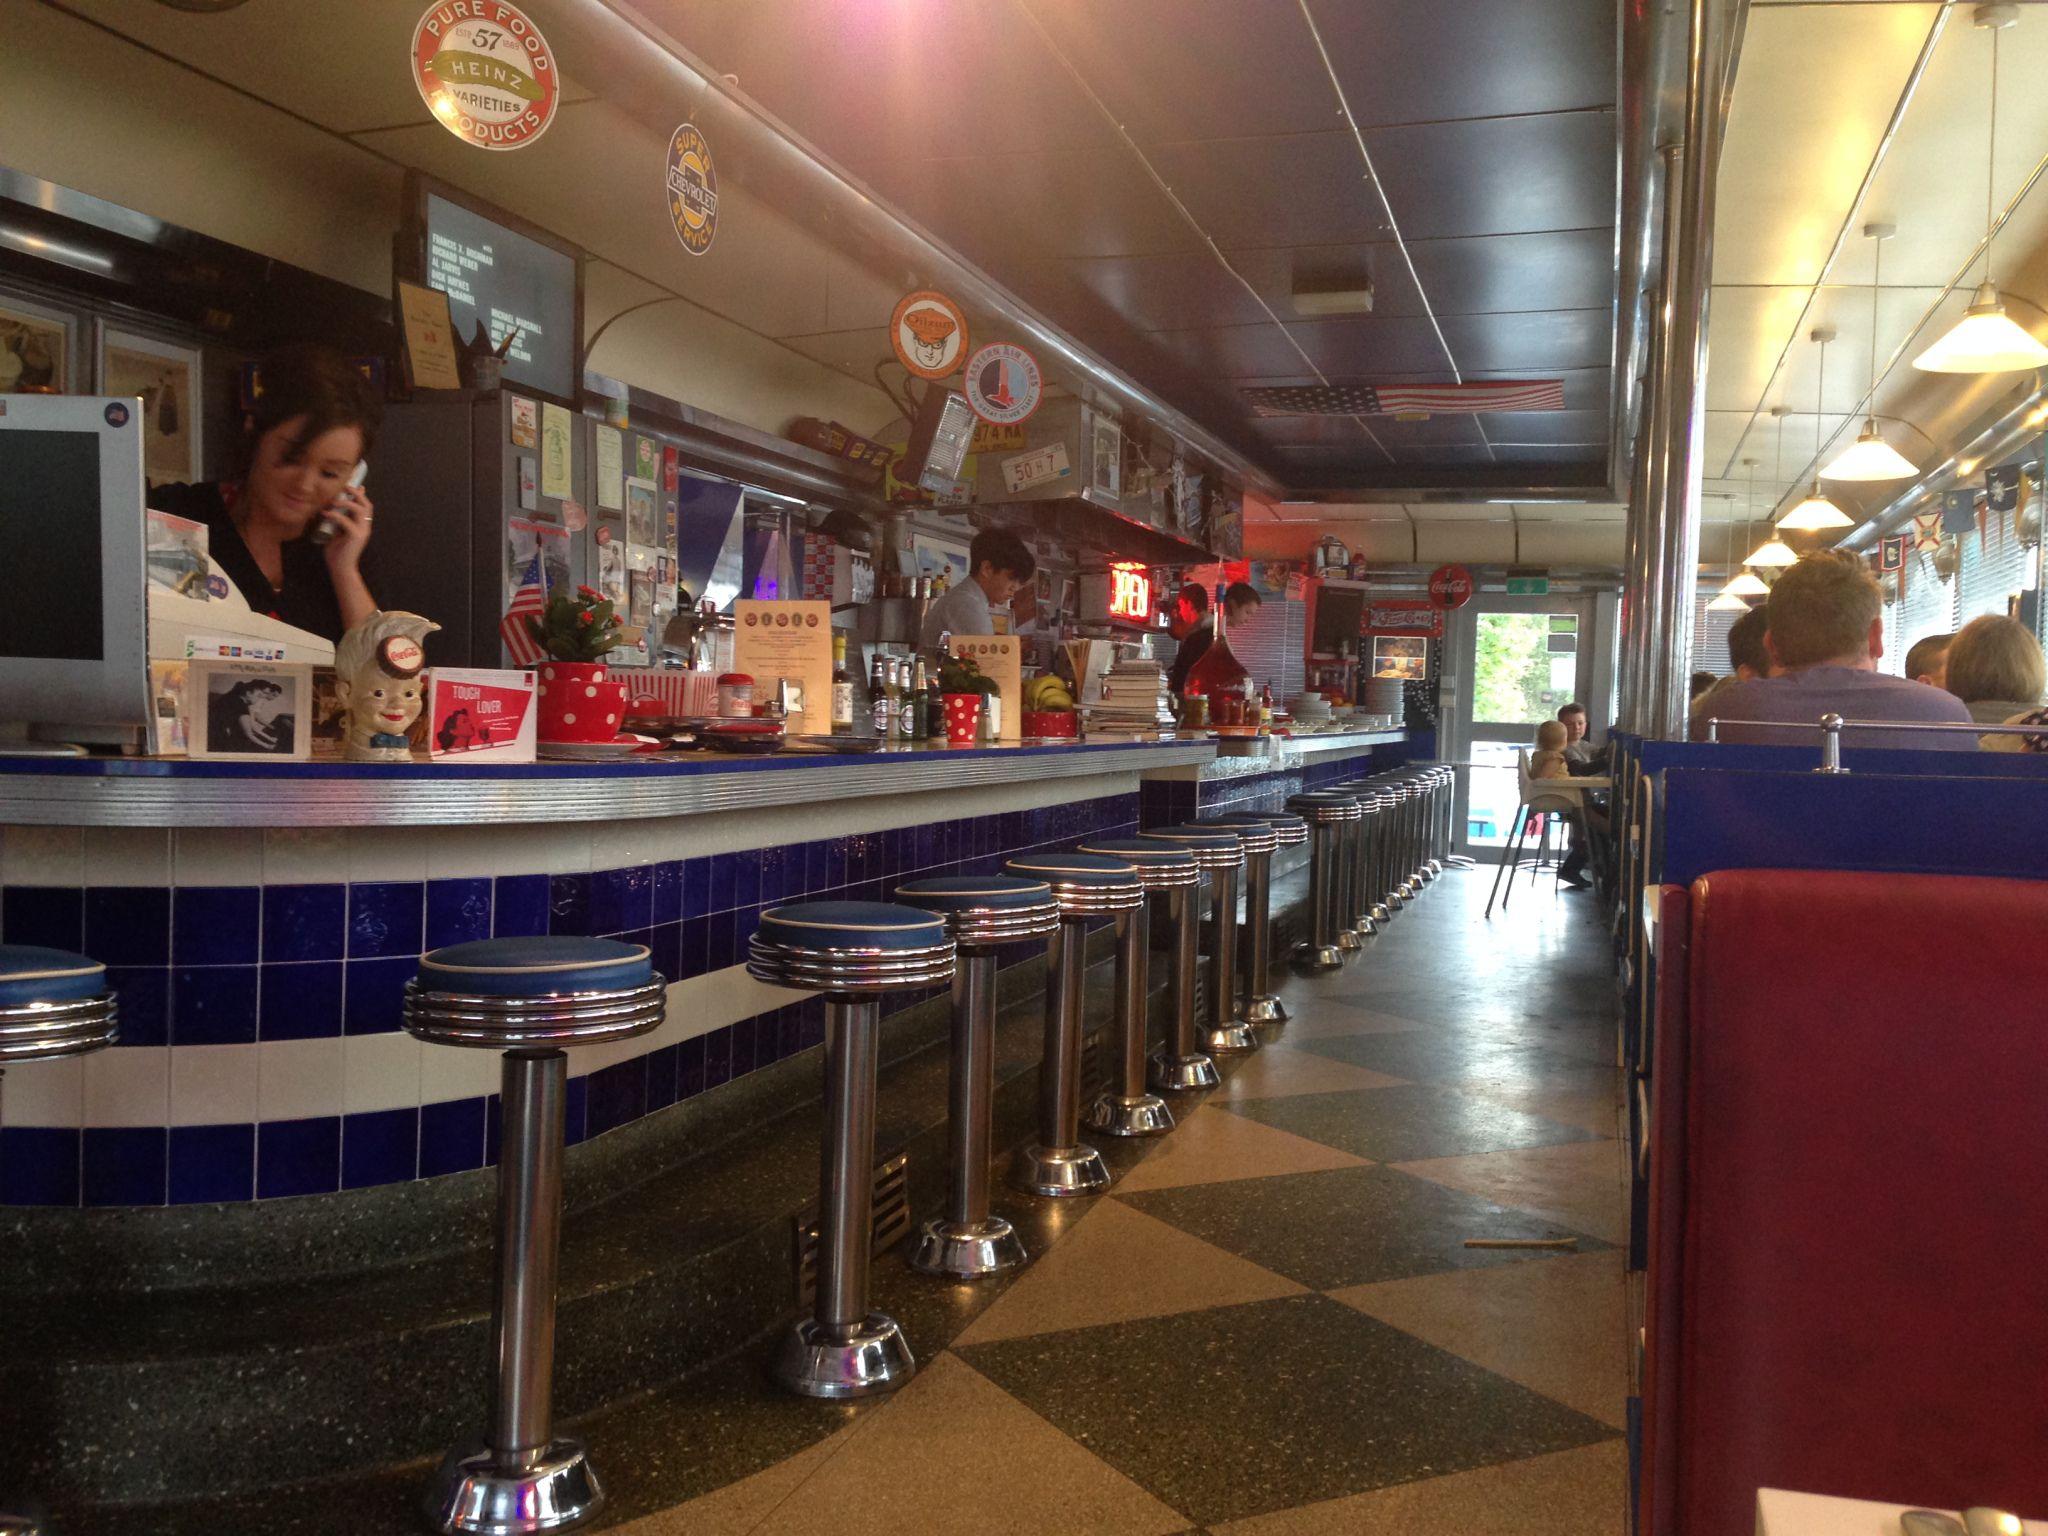 American \'50s diner in the UK | Retro Diner Style Rocks! | Pinterest